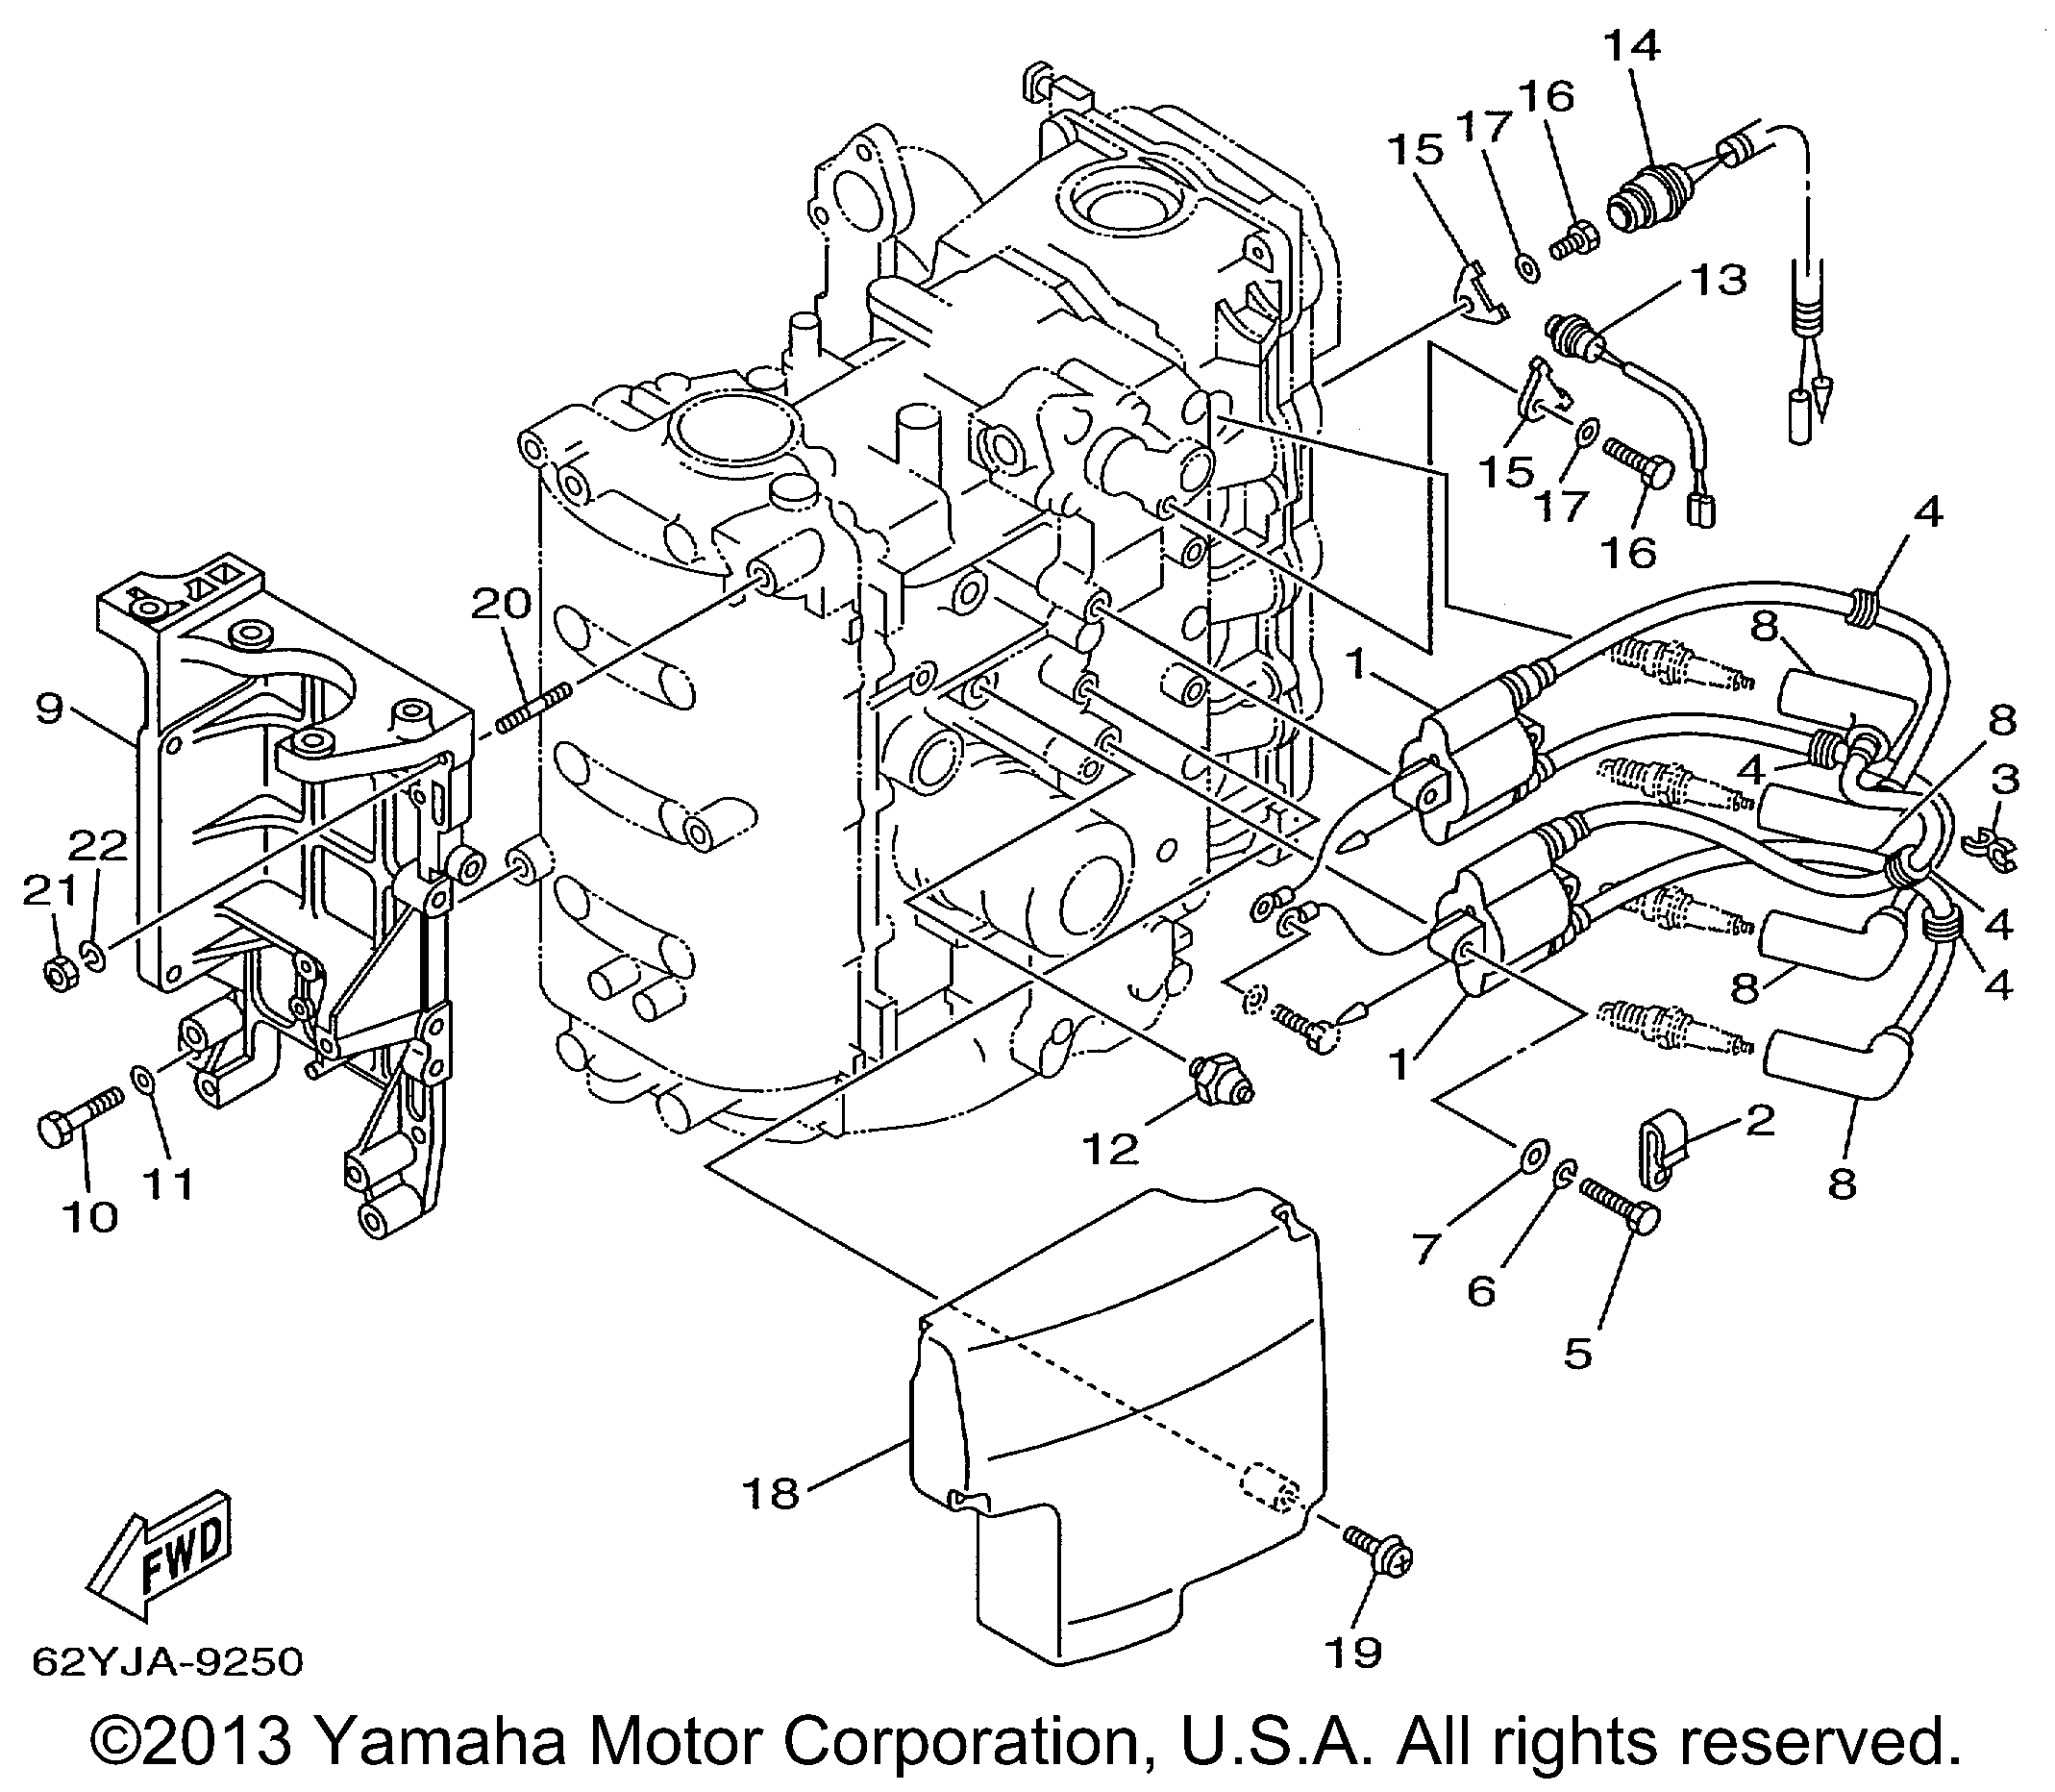 Yamaha | OUTBOARD | F40 F50 T50TRX | ELECTRICAL 1